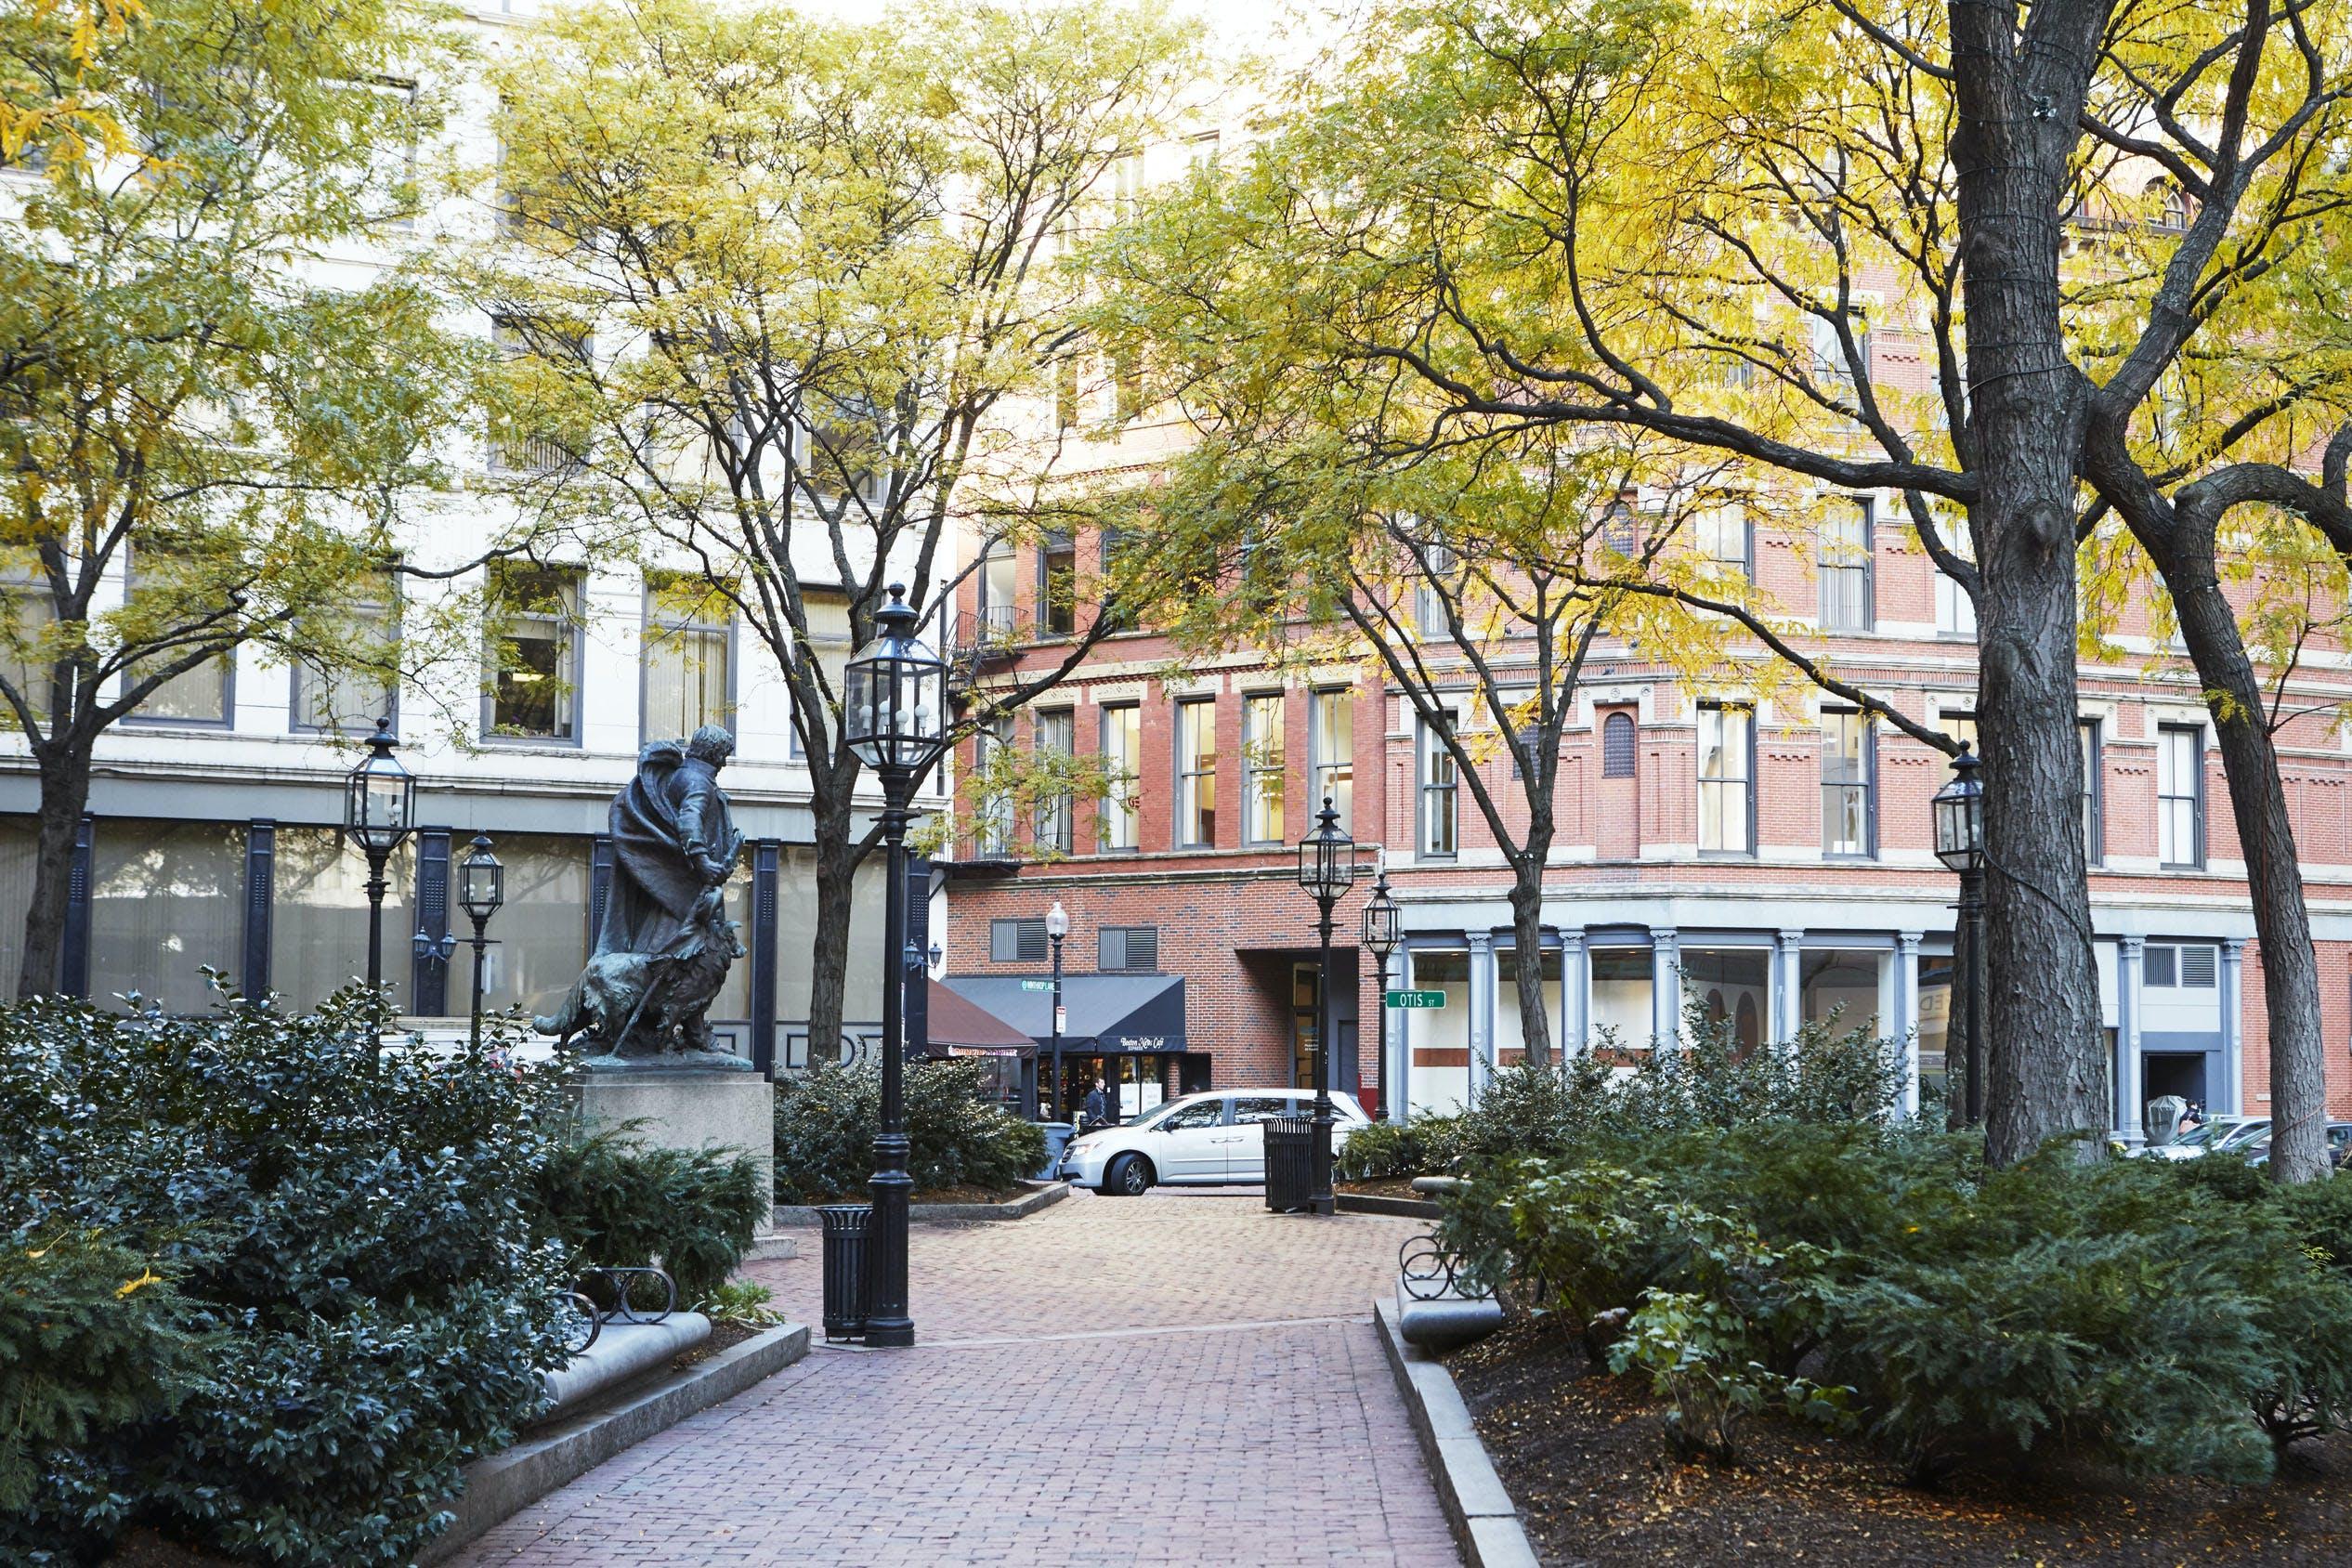 Boston Financial District neighborhood